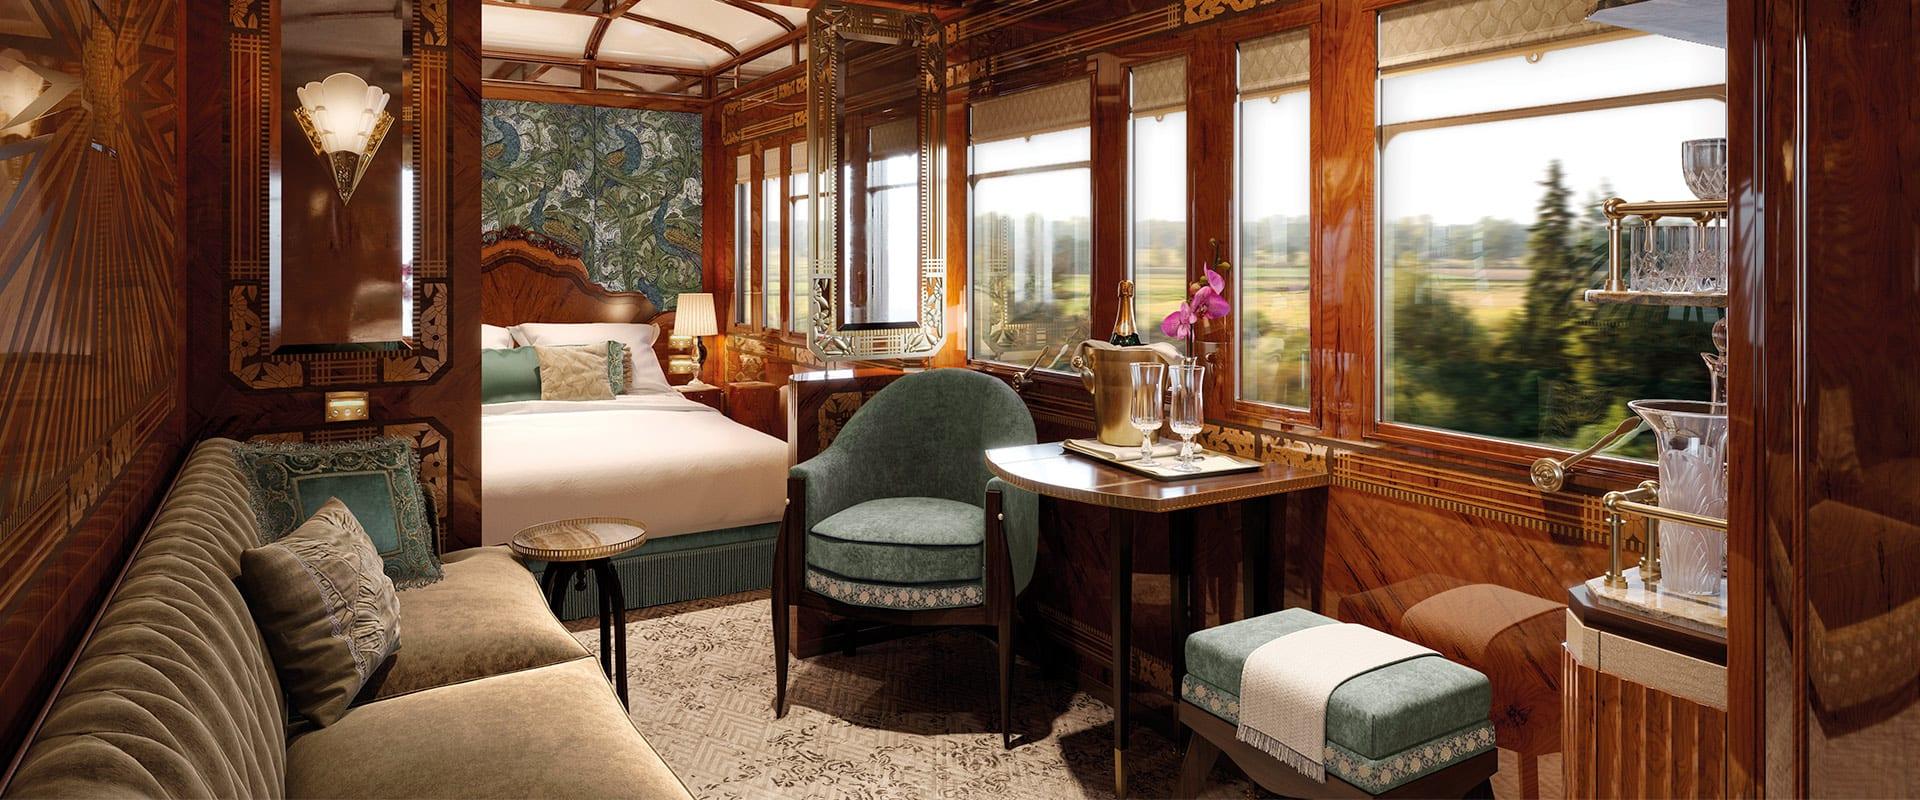 Venice Simplon-Orient-Express de Londres a Veneza